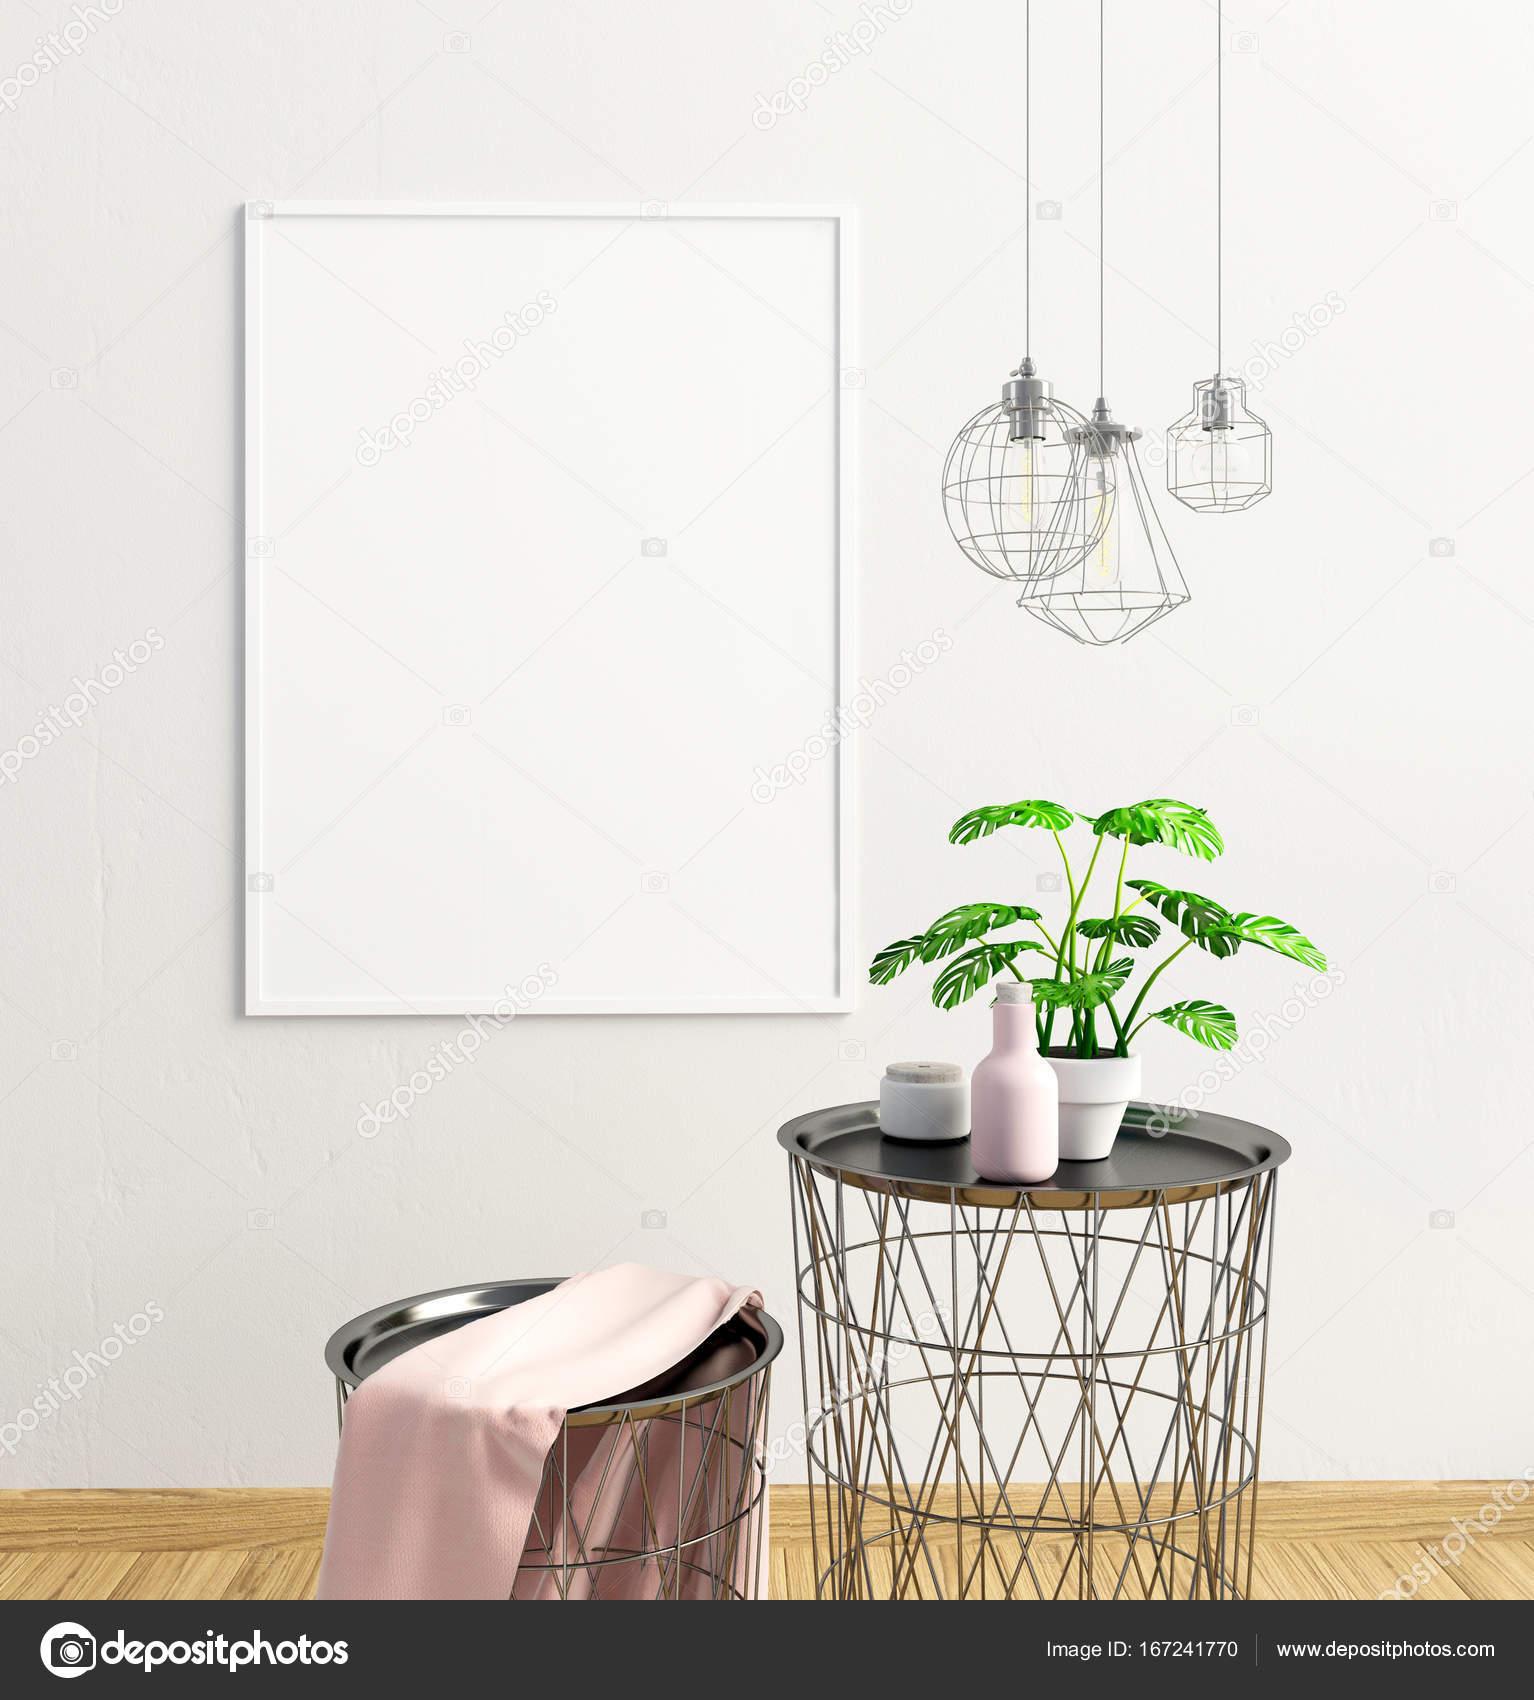 Modernes Interieur des skandinavischen Stil. 3D Illustration. Plakat ...